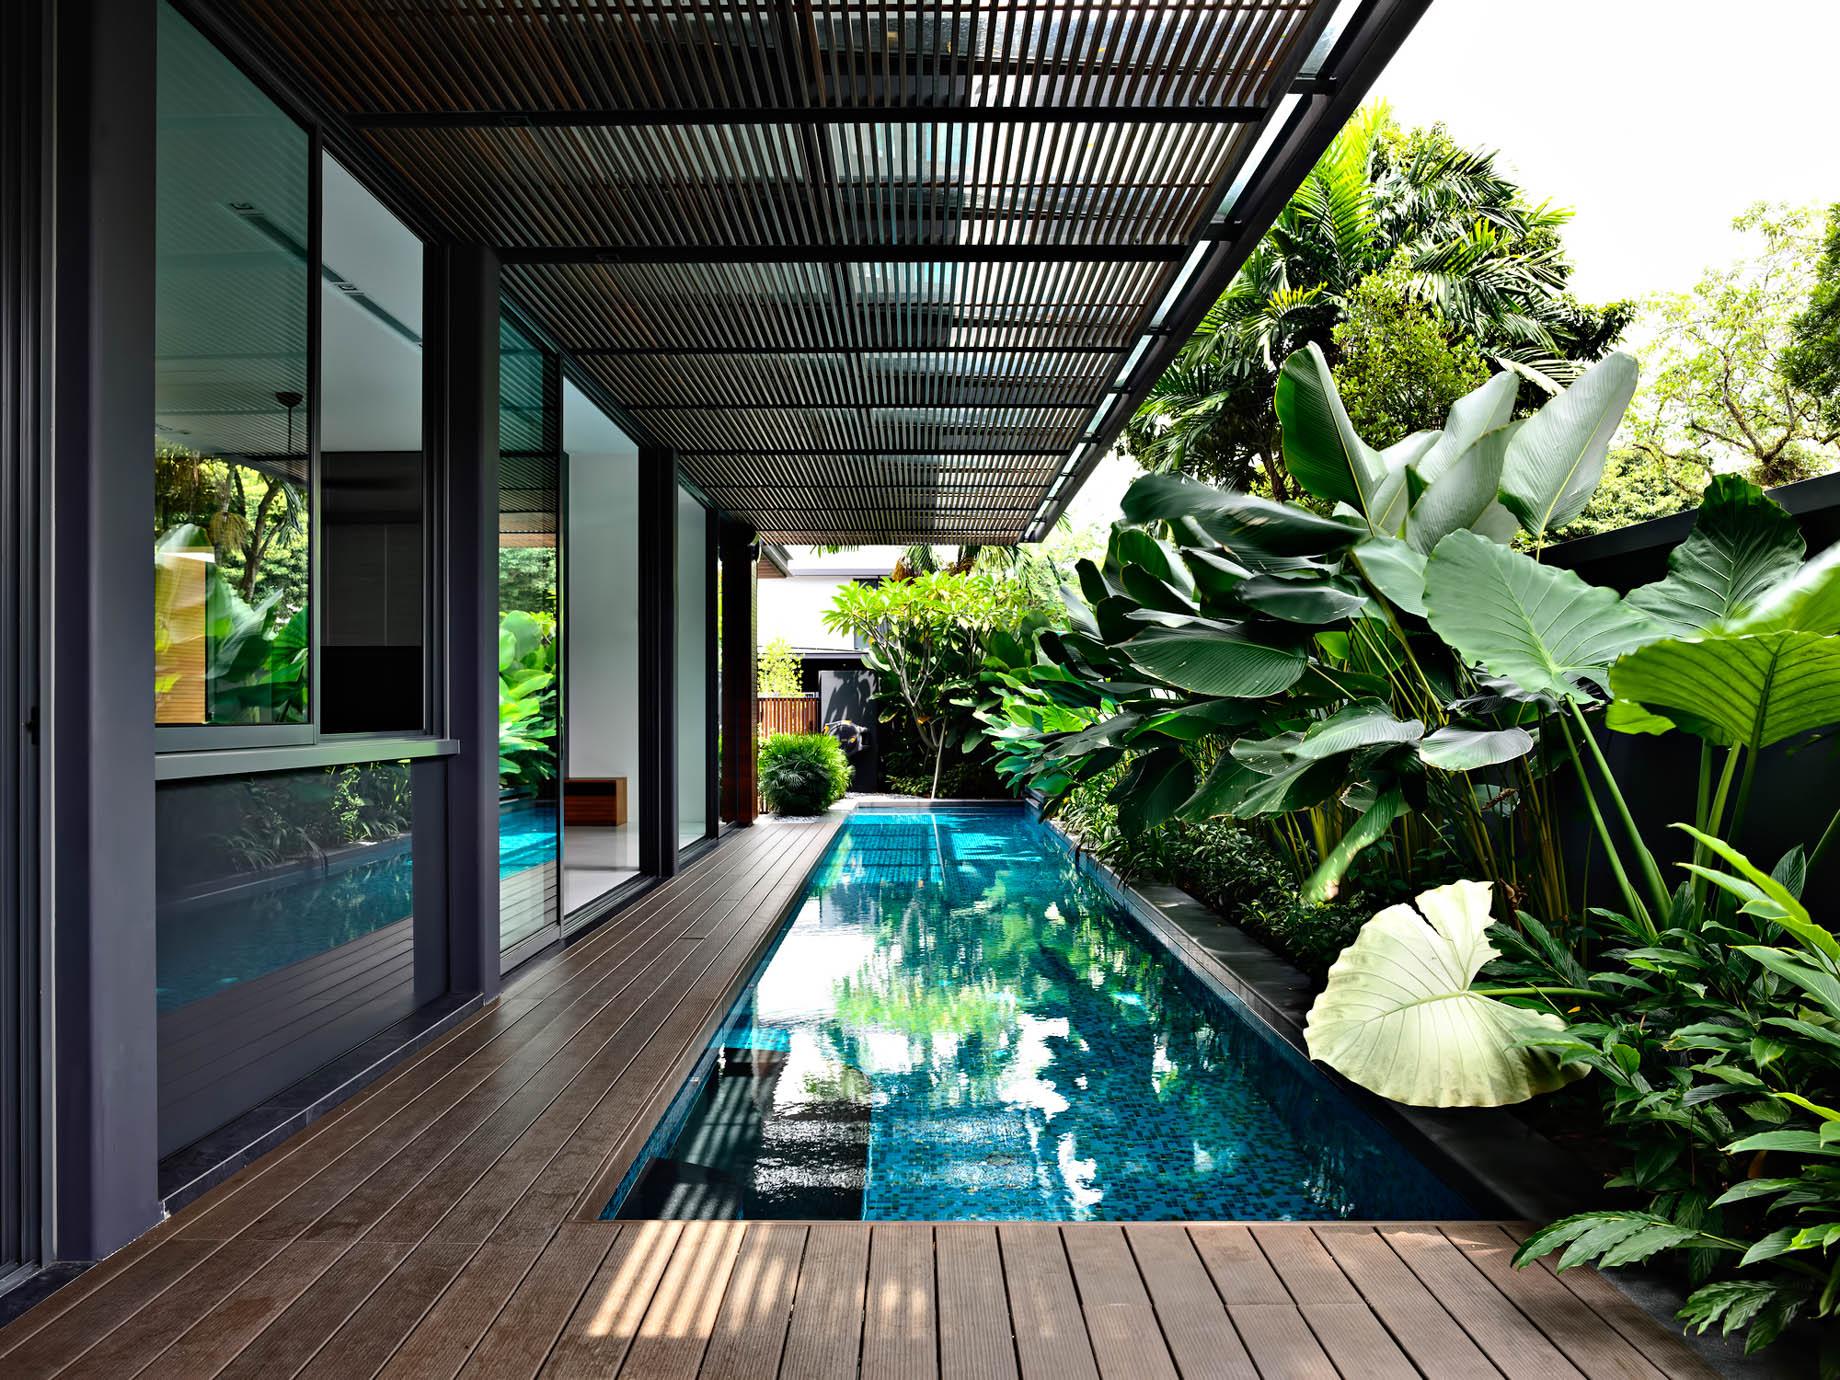 Verdant Verandah Luxury House - Princess of Wales Rd, Singapore